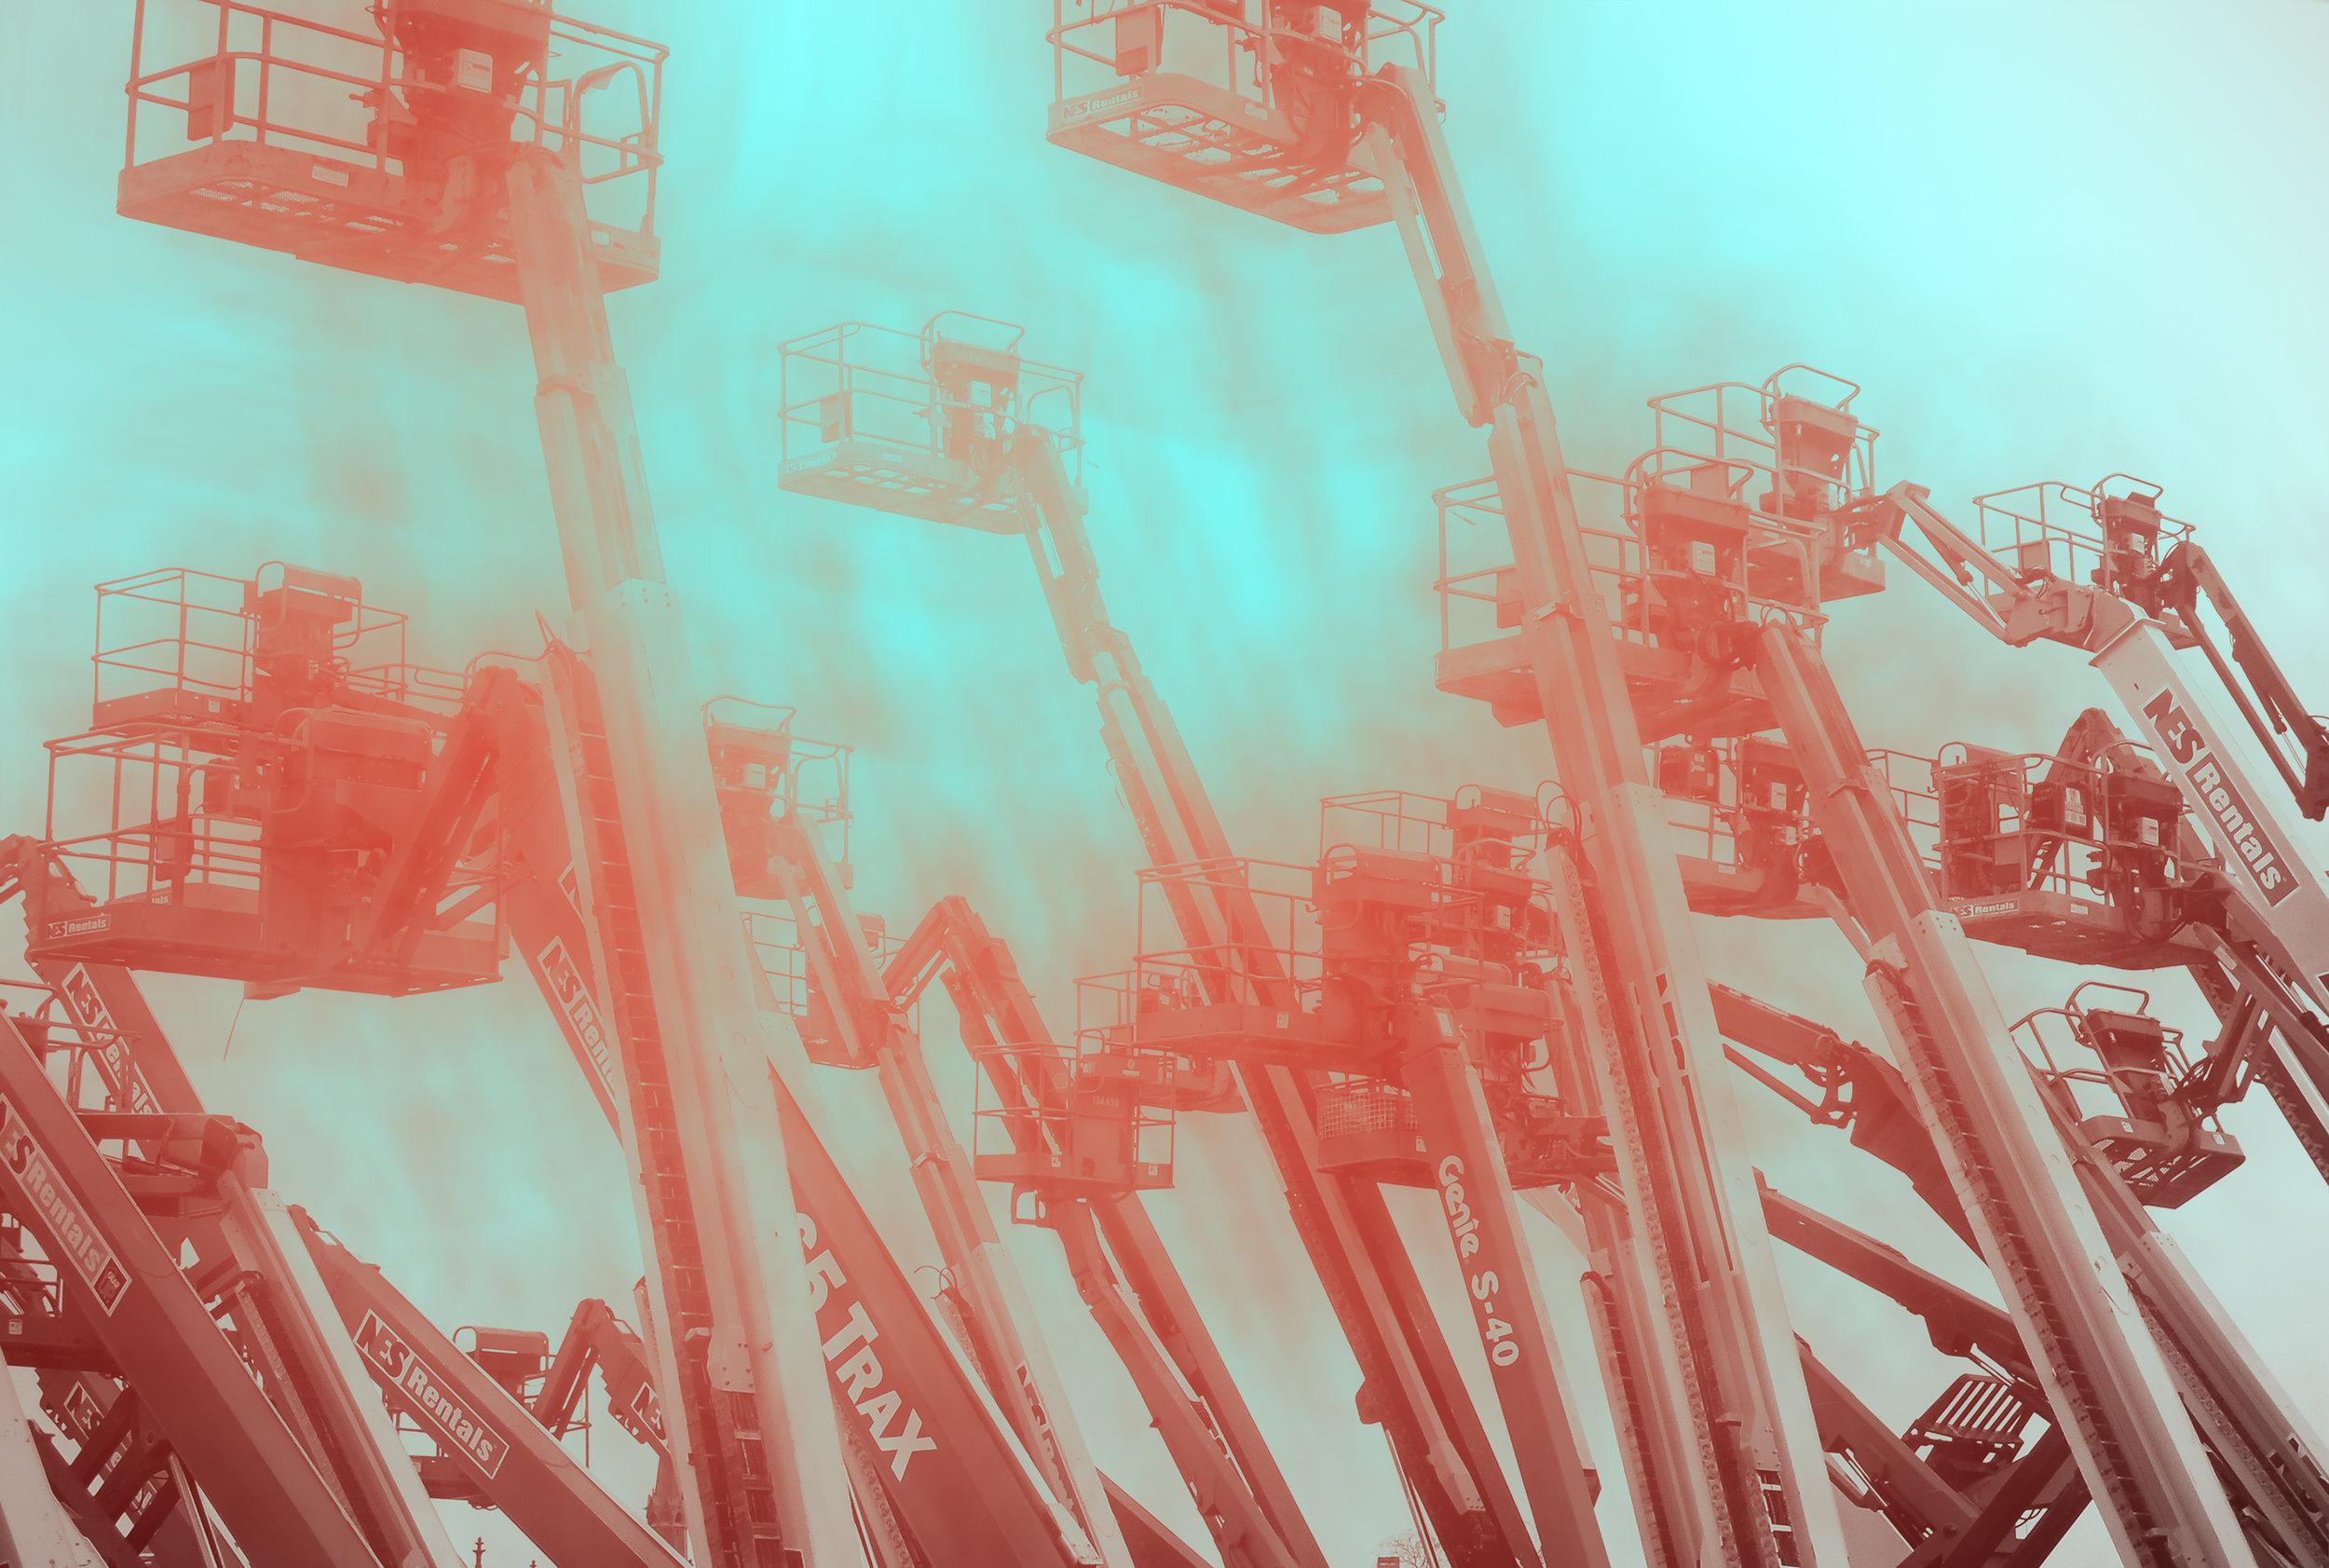 "Jeffrey Heyne ,  Cranes with Vermilion and Phthalo Blue 6:40pm, digital photograph on plexiglass, 16"" x 24"", $1,000"